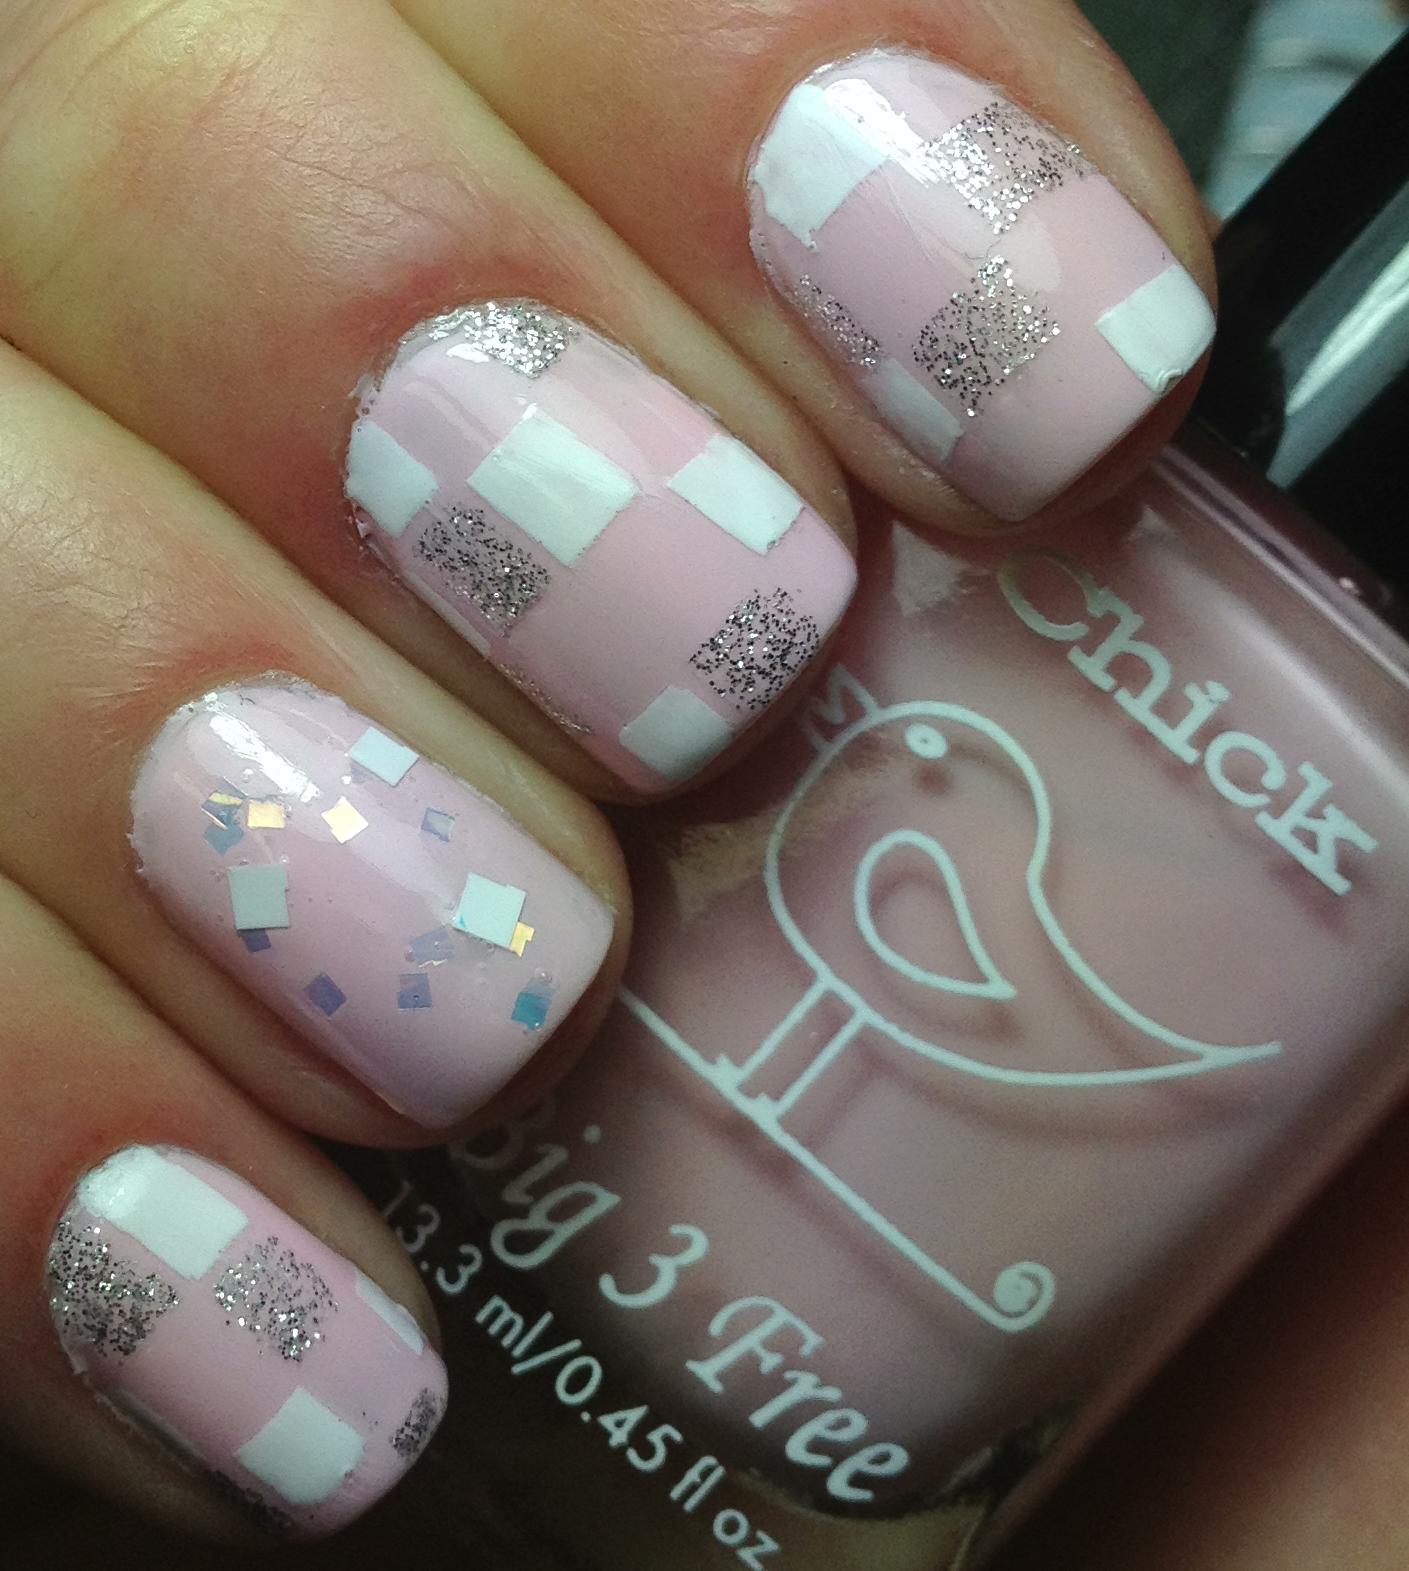 Nails by an OPI Addict: Chick Nail Polish: Doll Face